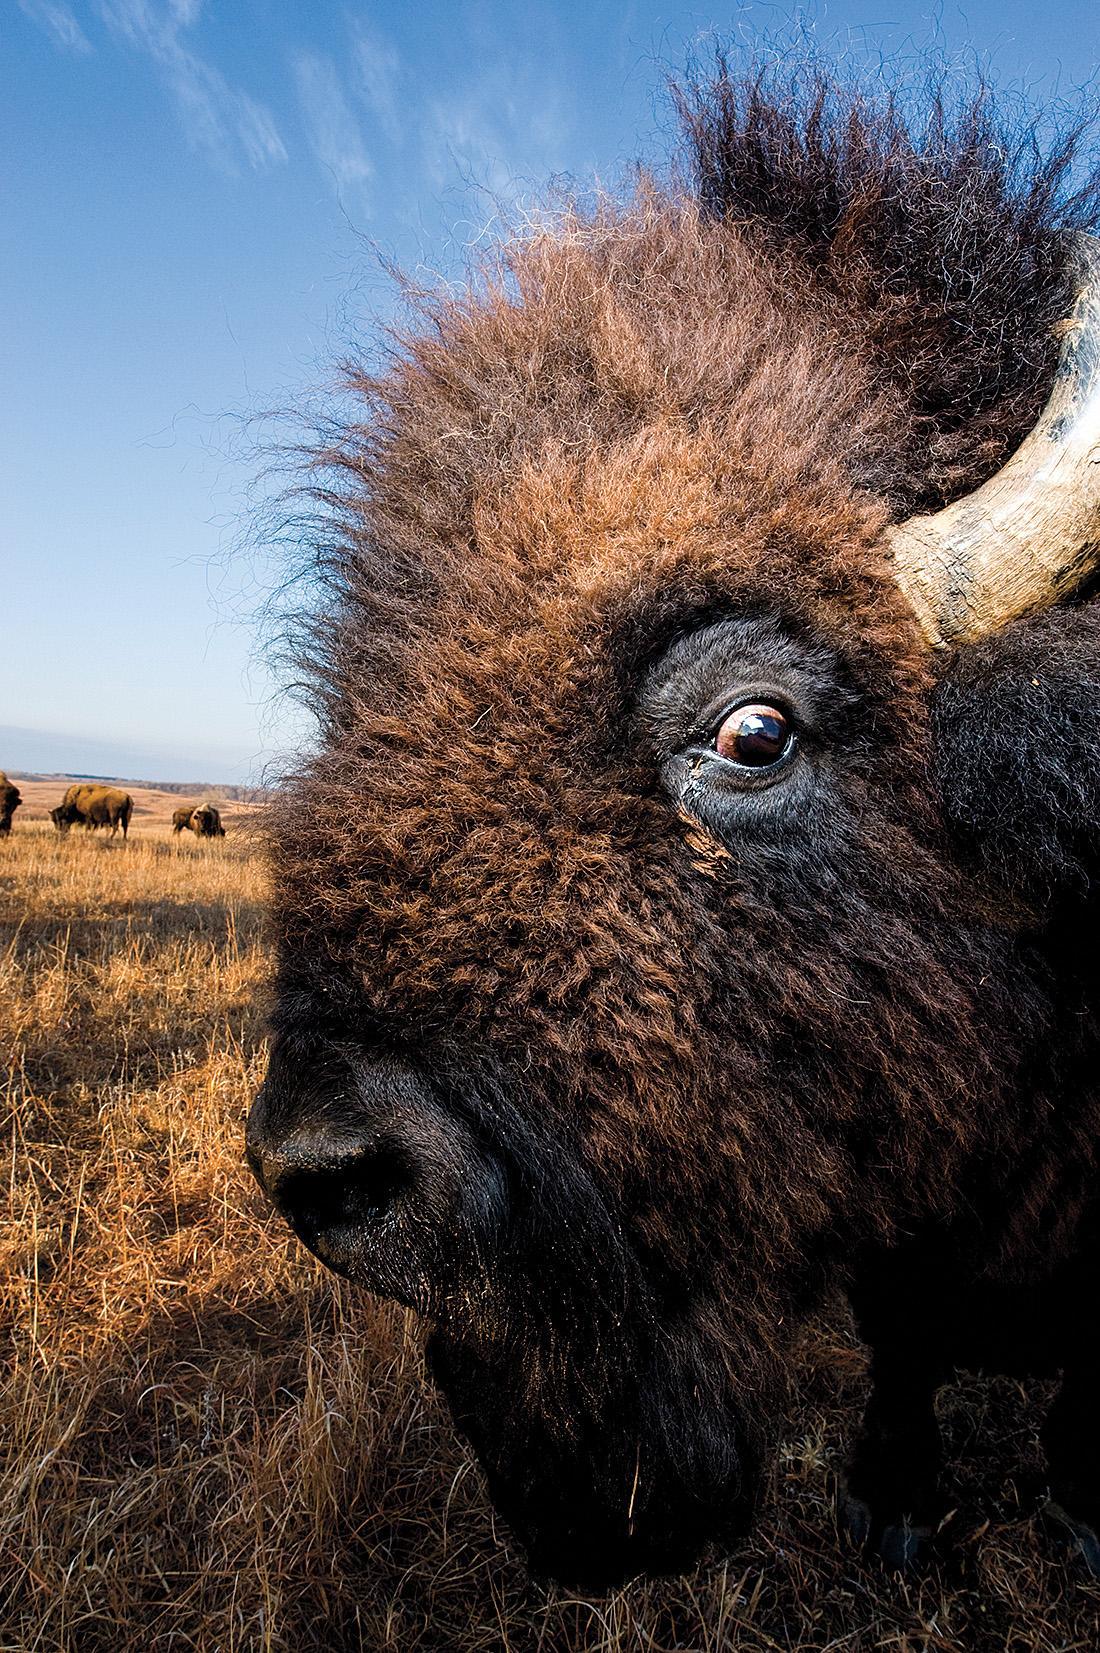 Bison close-up